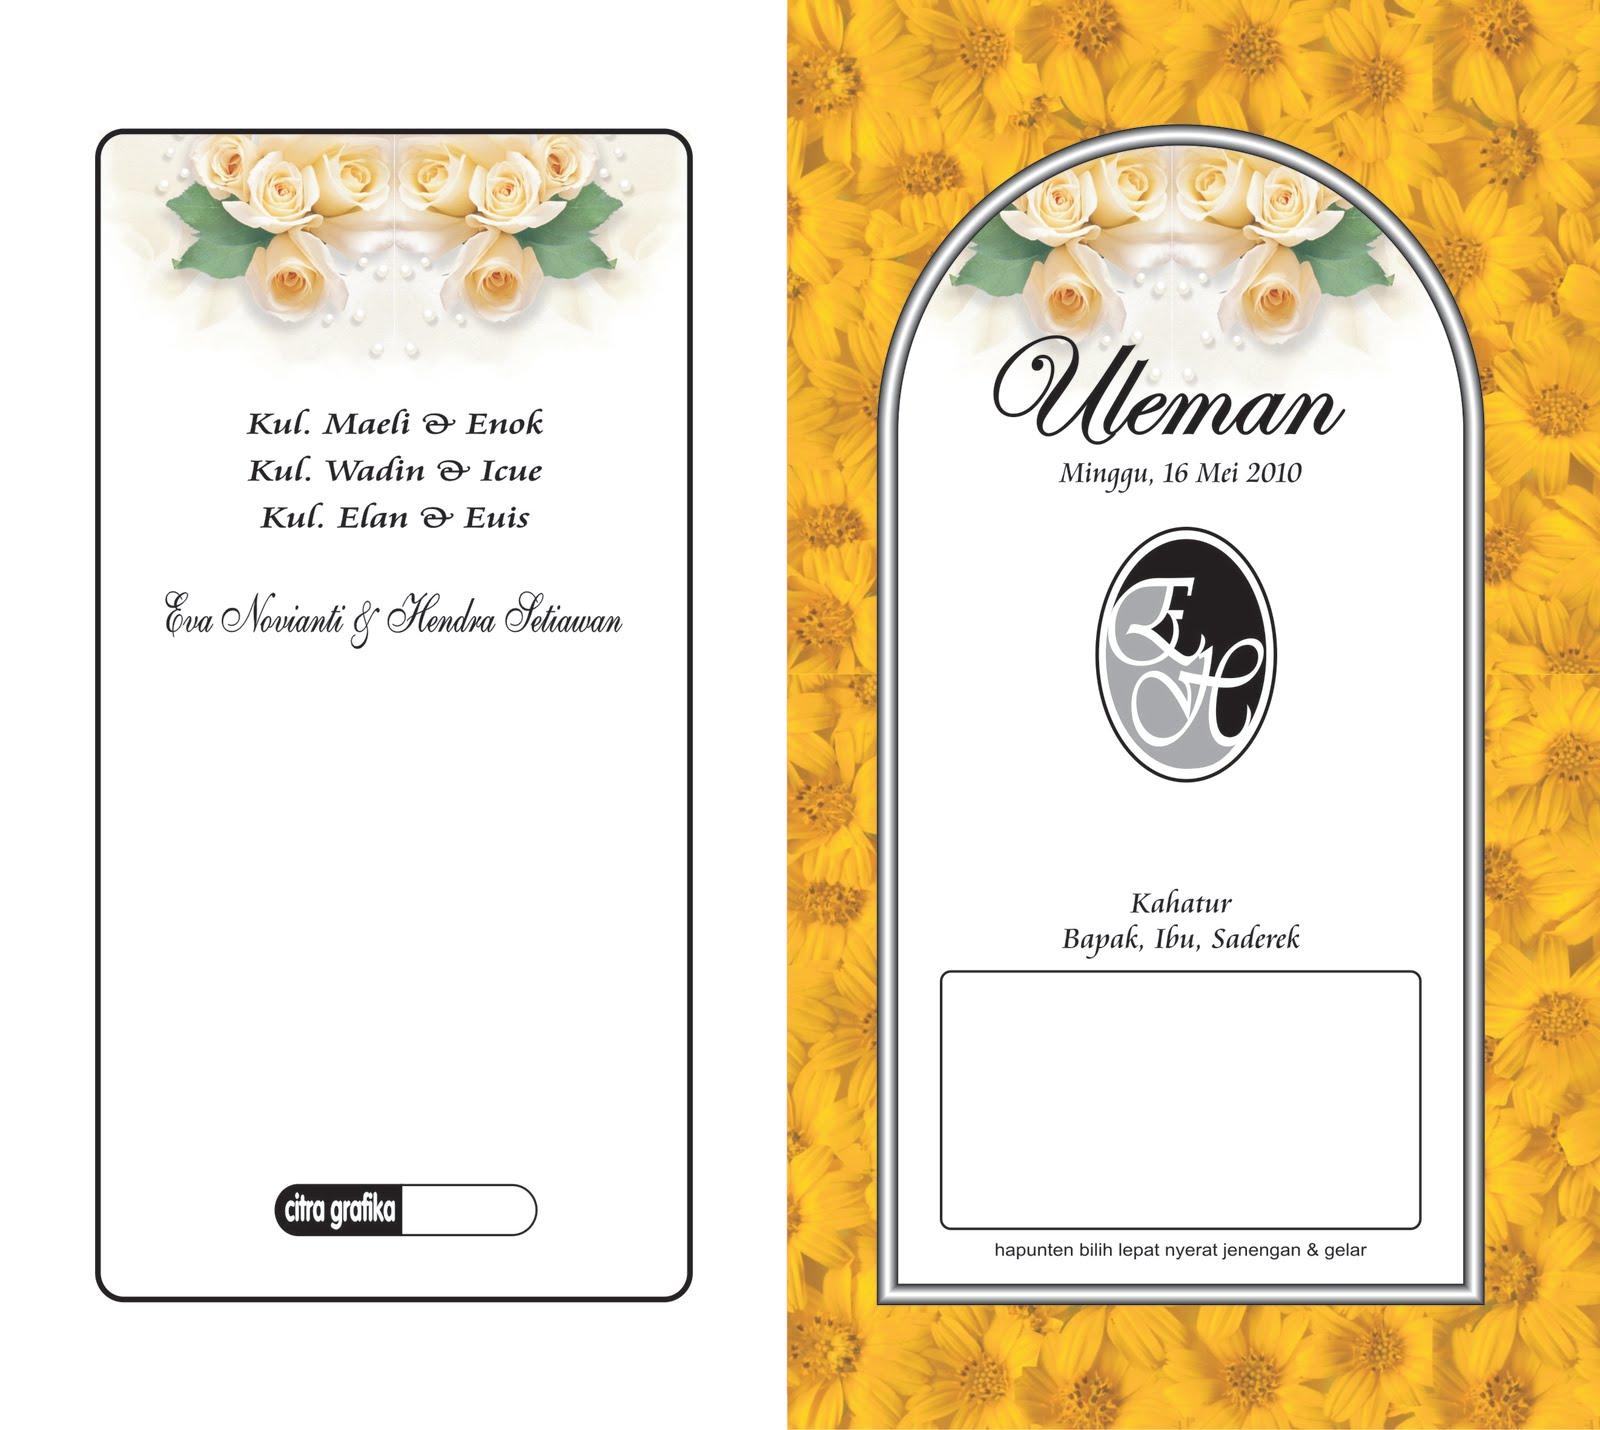 Software Undangan Pernikahan Aplikasi Membuat Undangan Pernikahan225